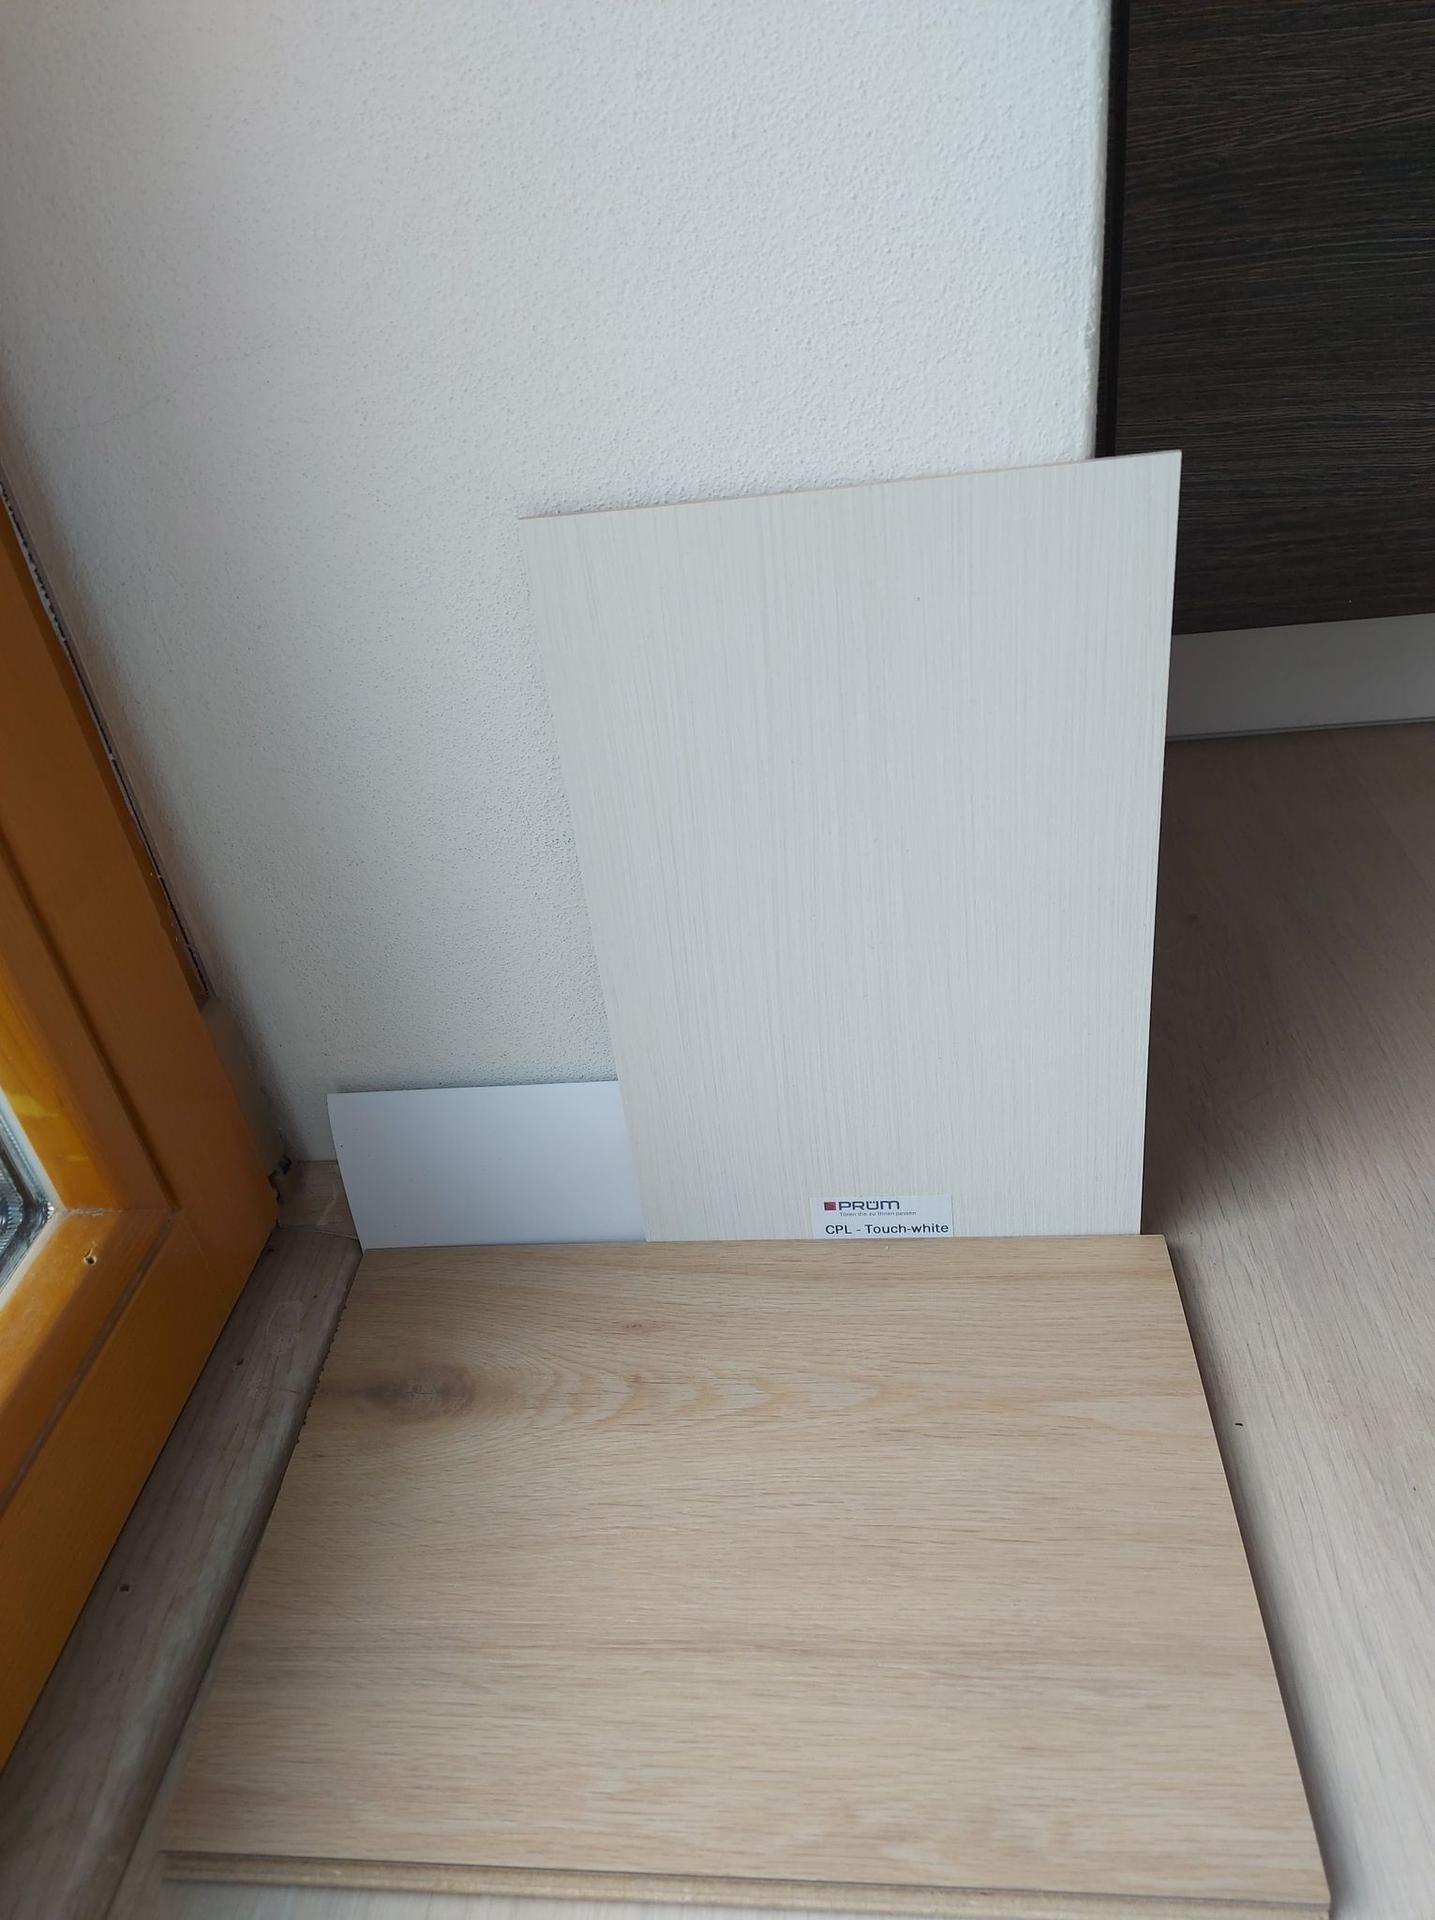 Co vyberem za dvere? - vybrano :) se vzorkem listy a podlahy :) bude to PRUM touch white